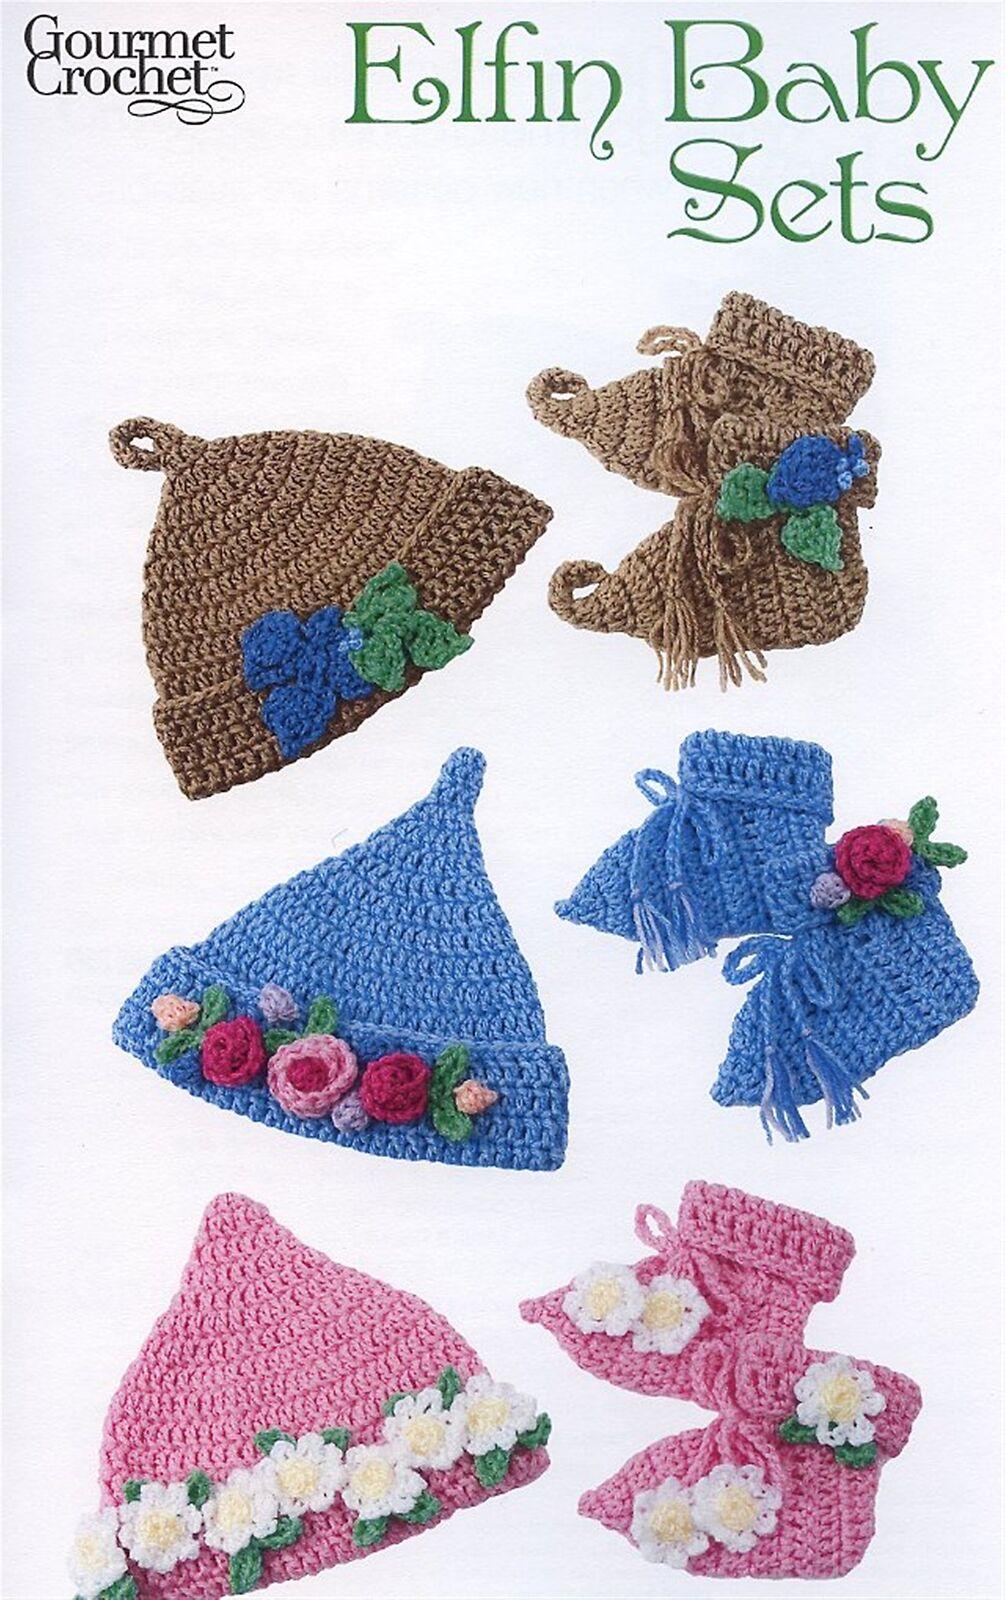 Preemie Booties : preemie, booties, Elfin, Booties, Preemie-6, Gourmet, Crochet, Pattern, Leaflet